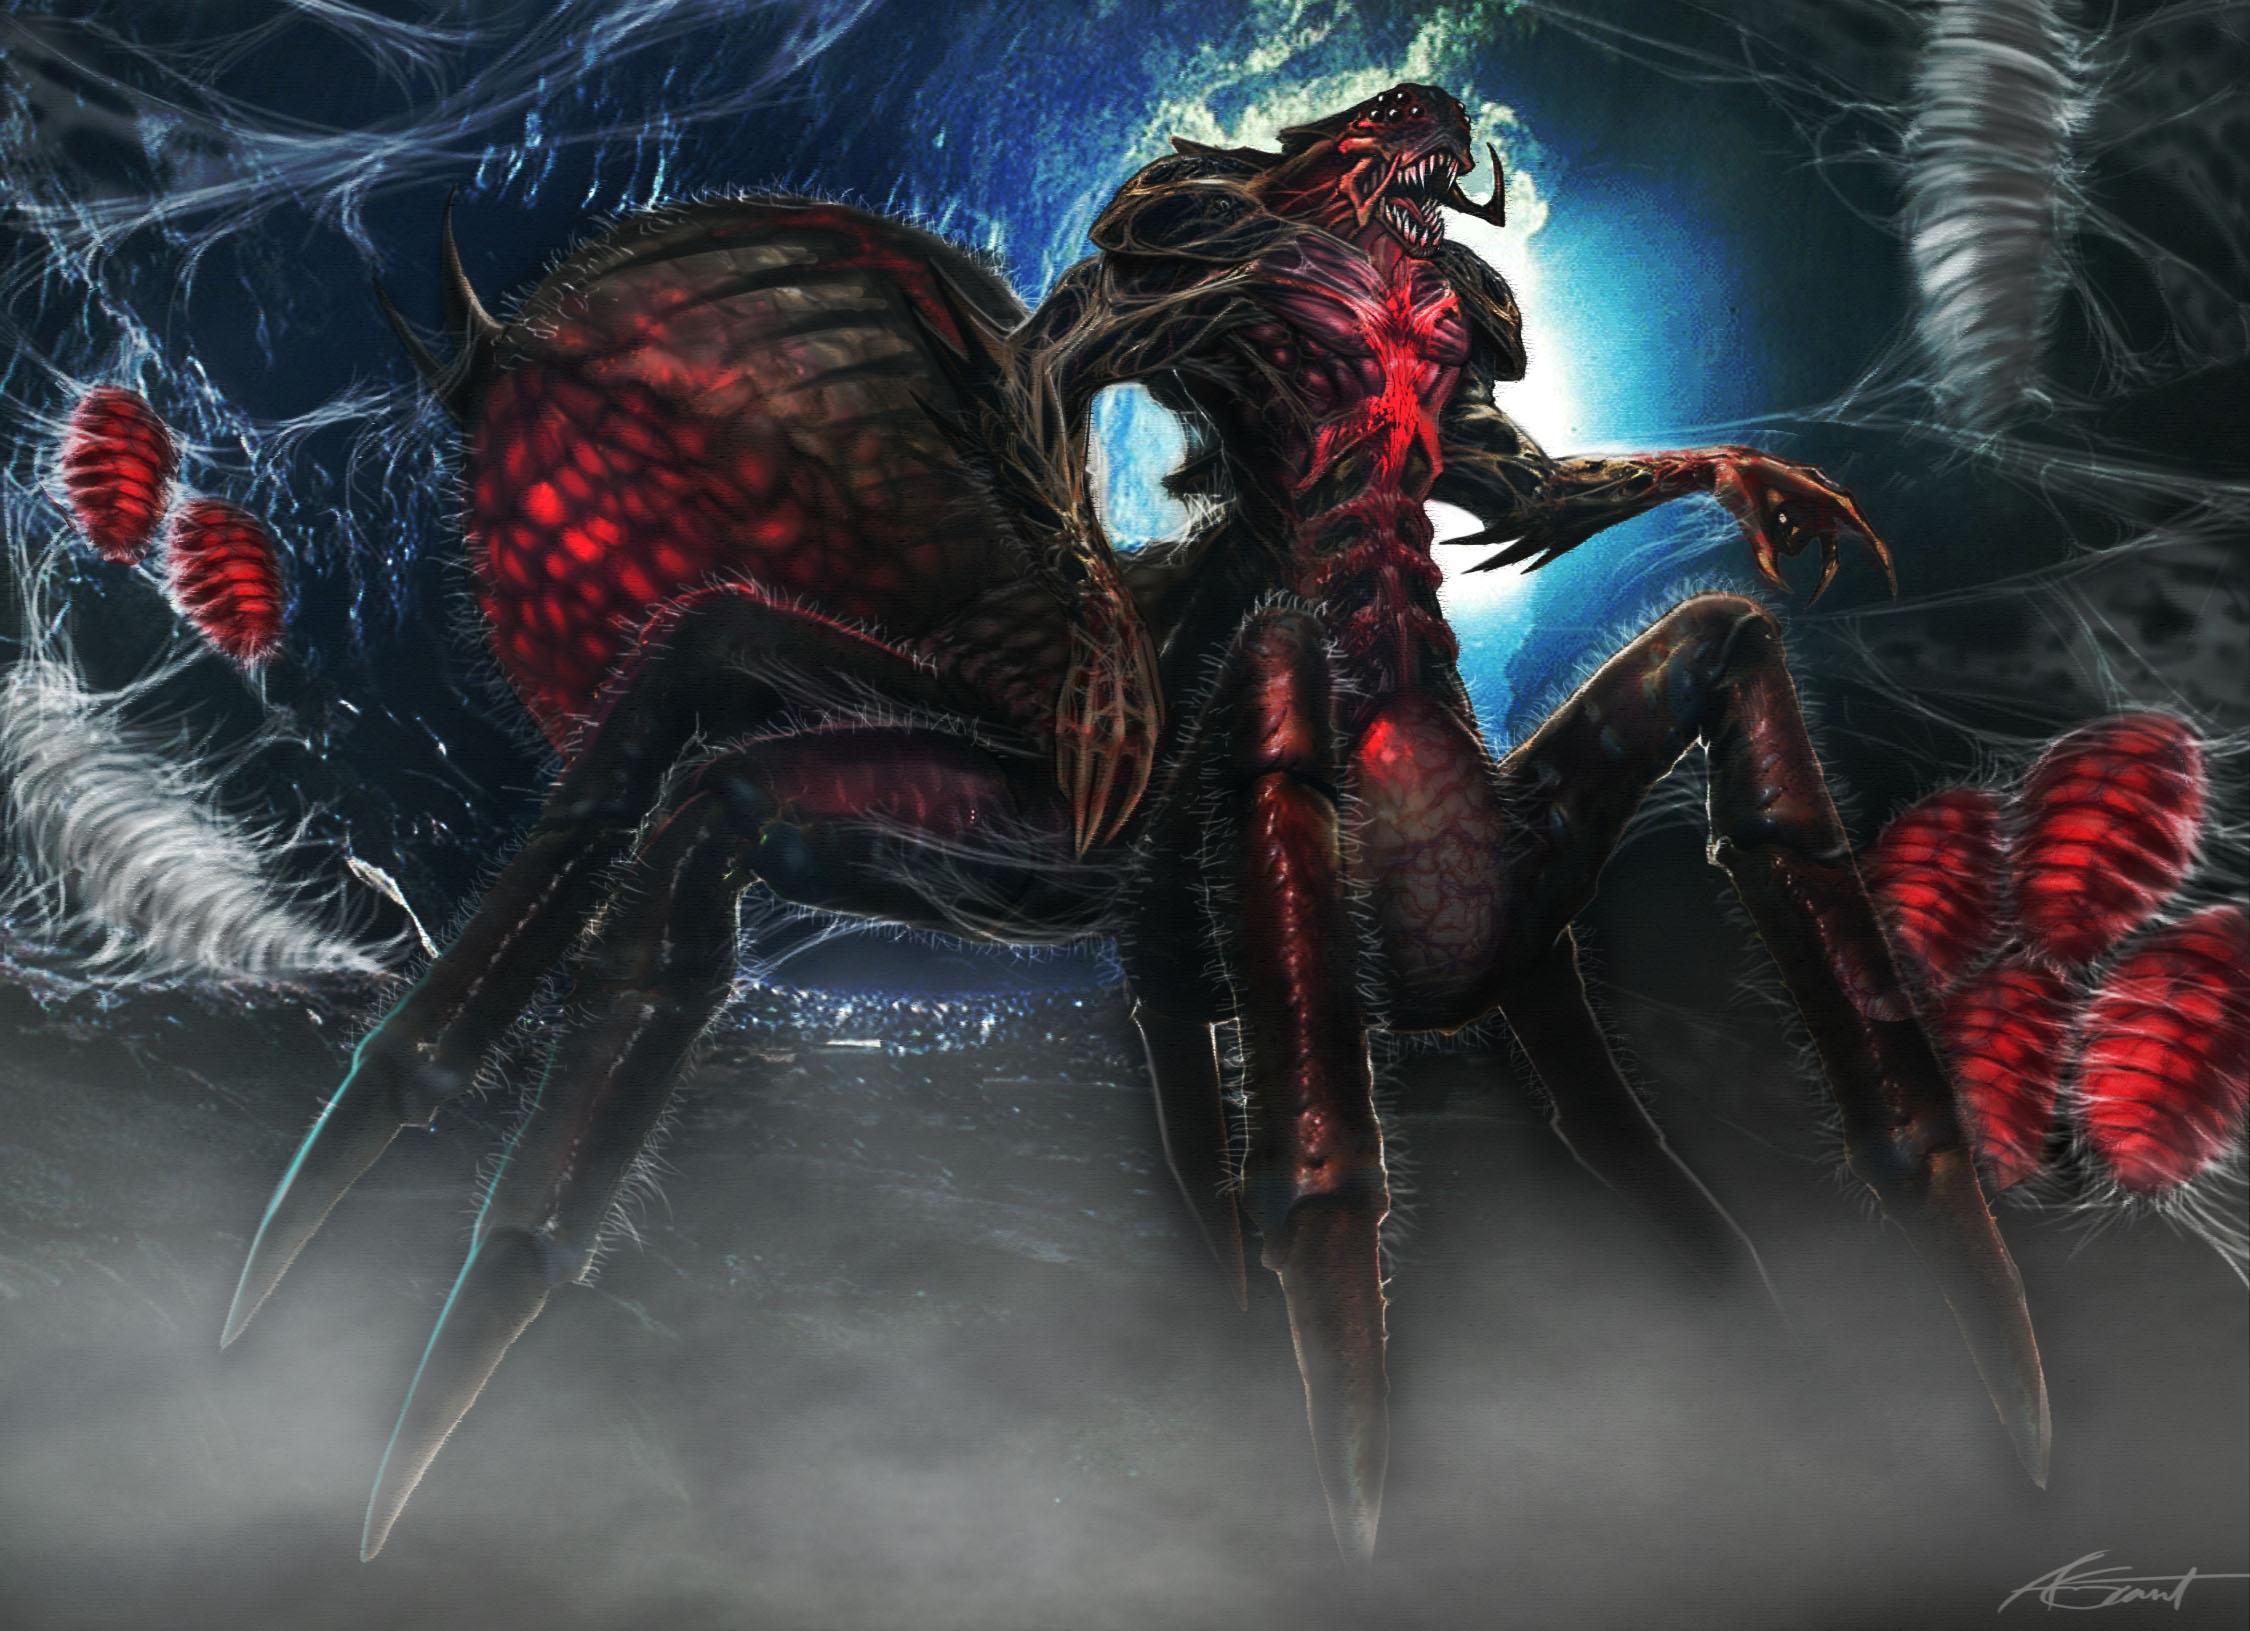 Alien Spider Concept Art